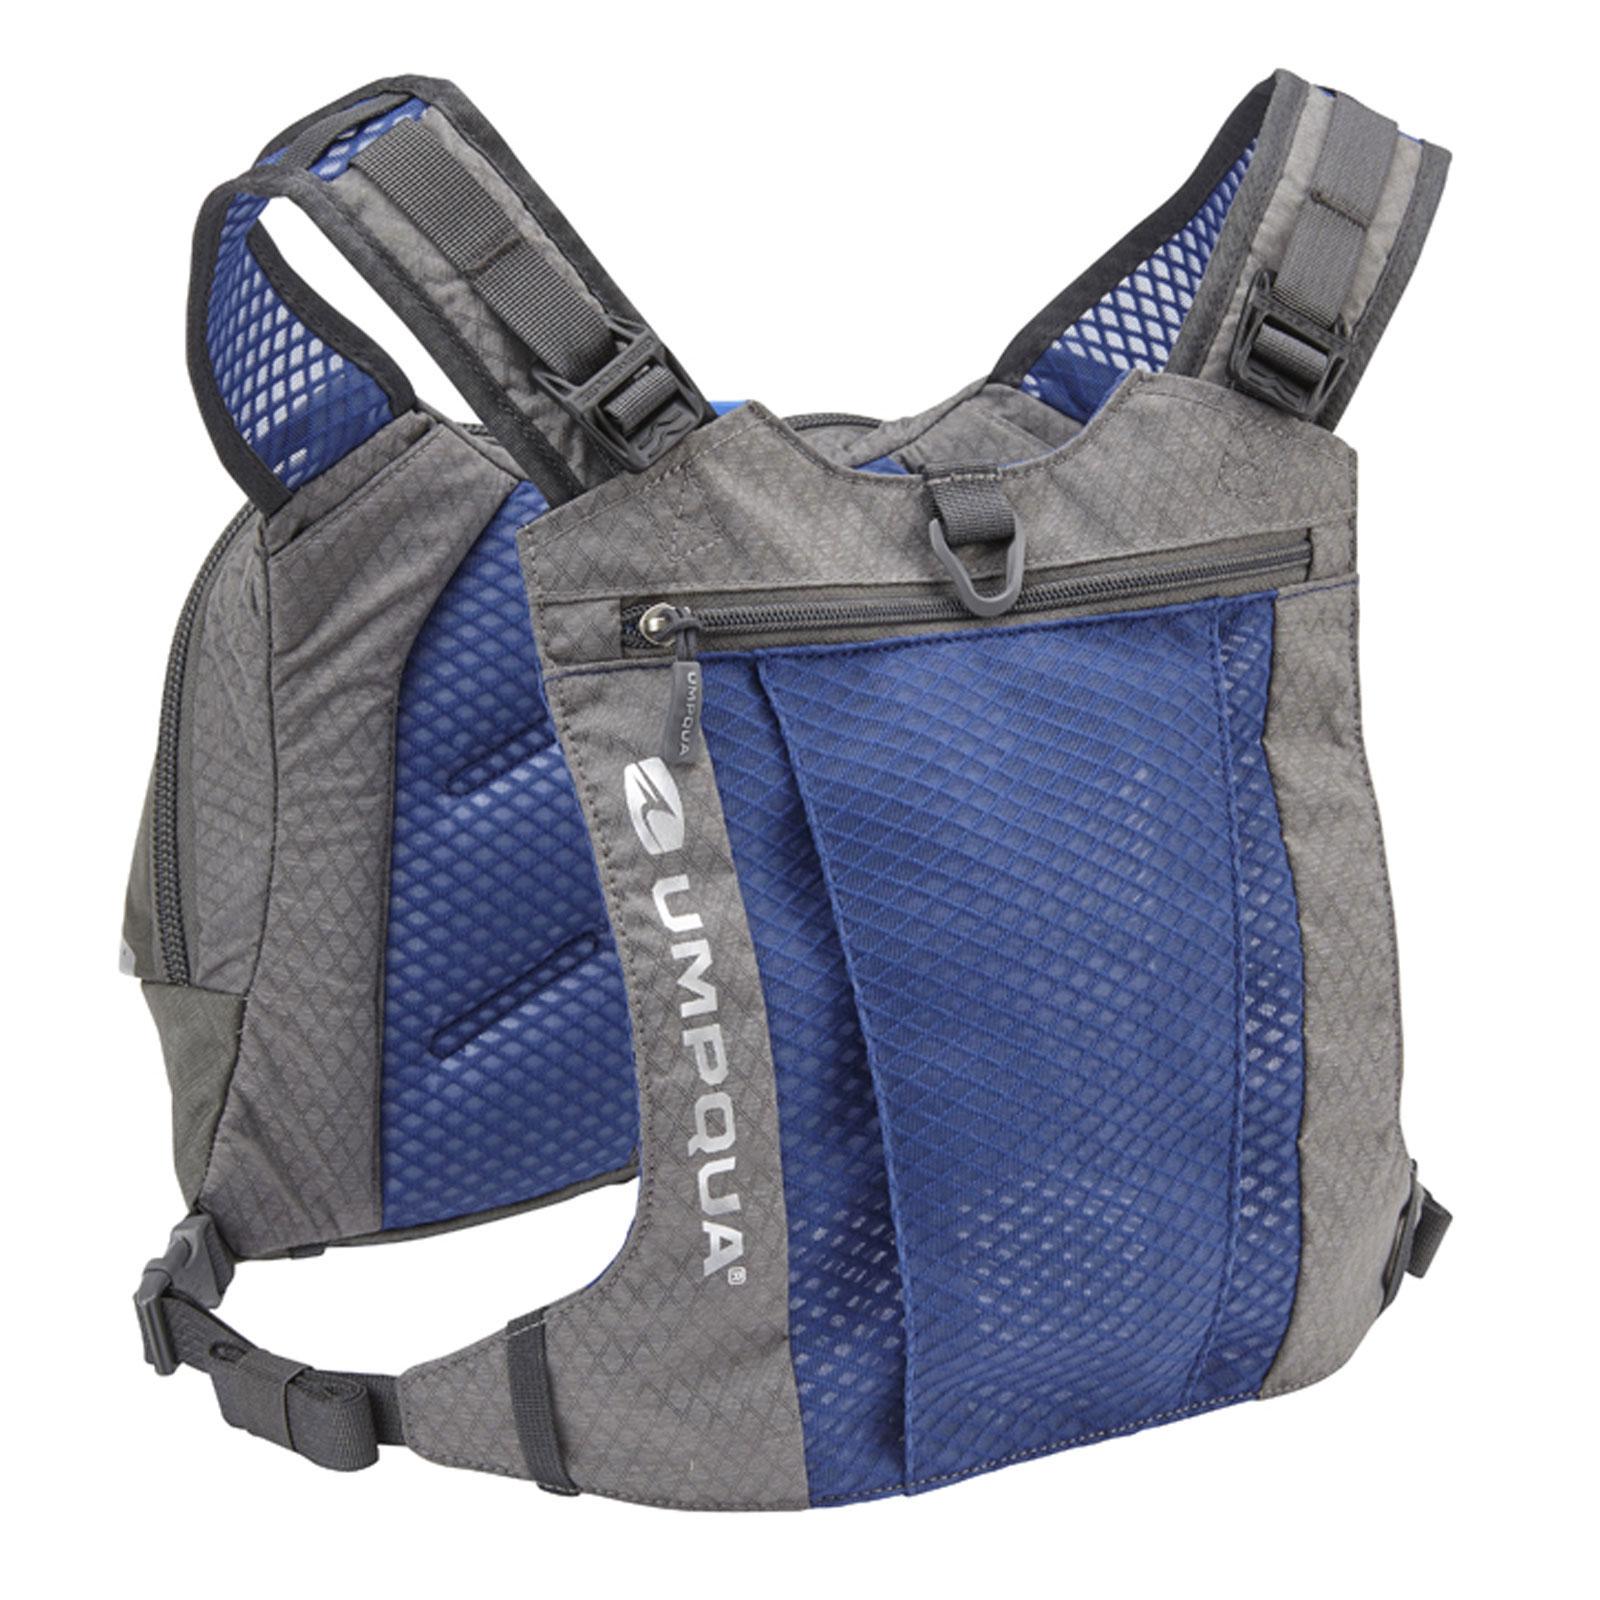 Umpqua overlook 500 zero sweep chest pack fly fishing kit for Fly fishing kits